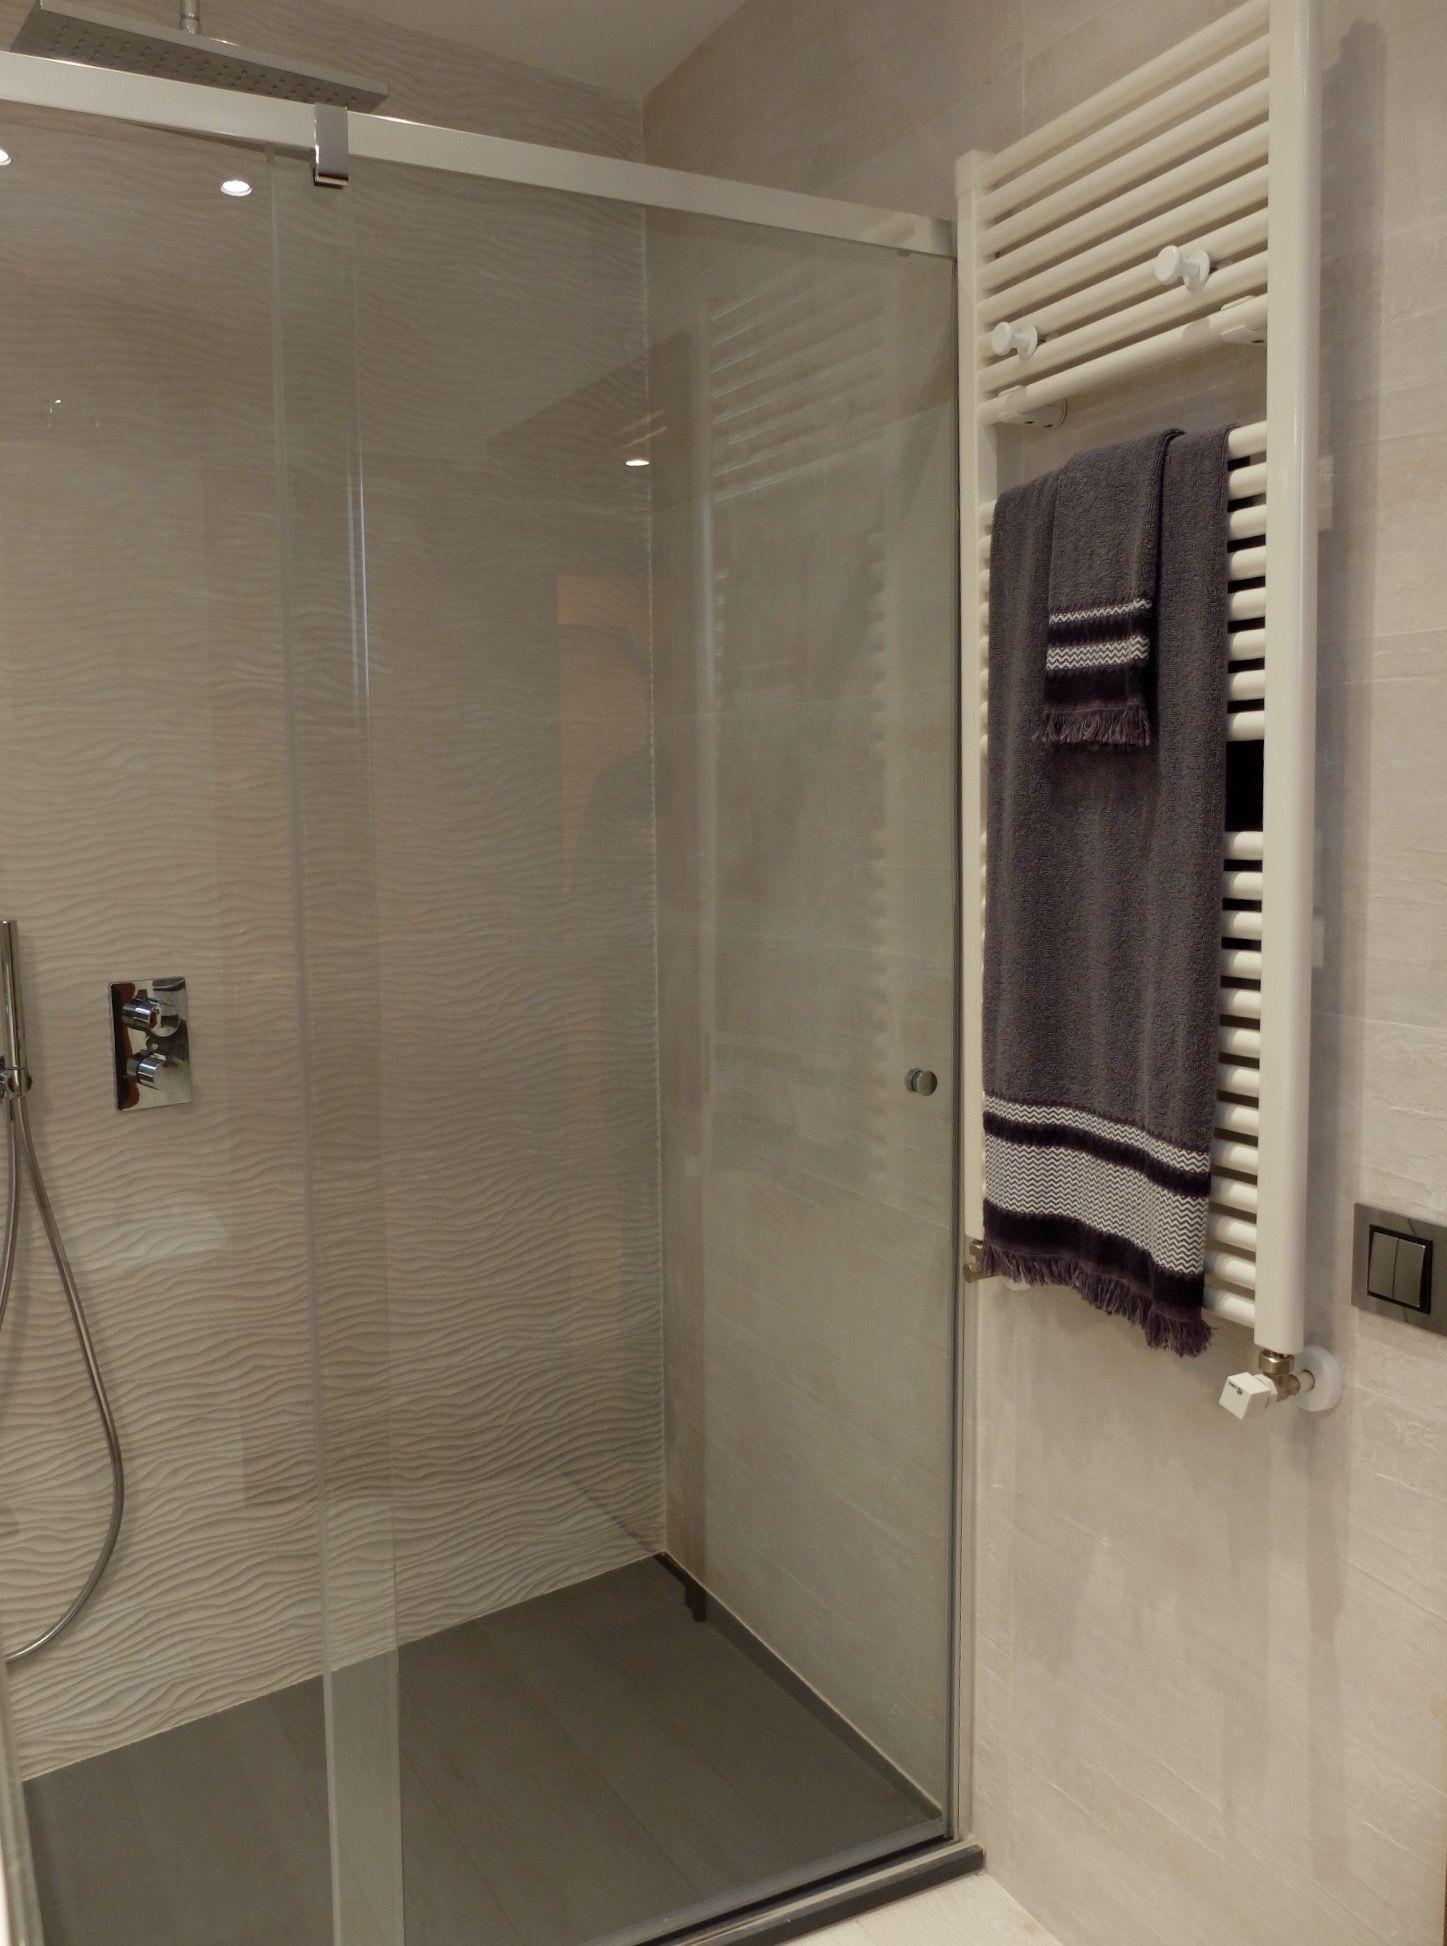 Reforma de ba o ducha y radiador toallero por for Cuartos de bano modernos con ducha